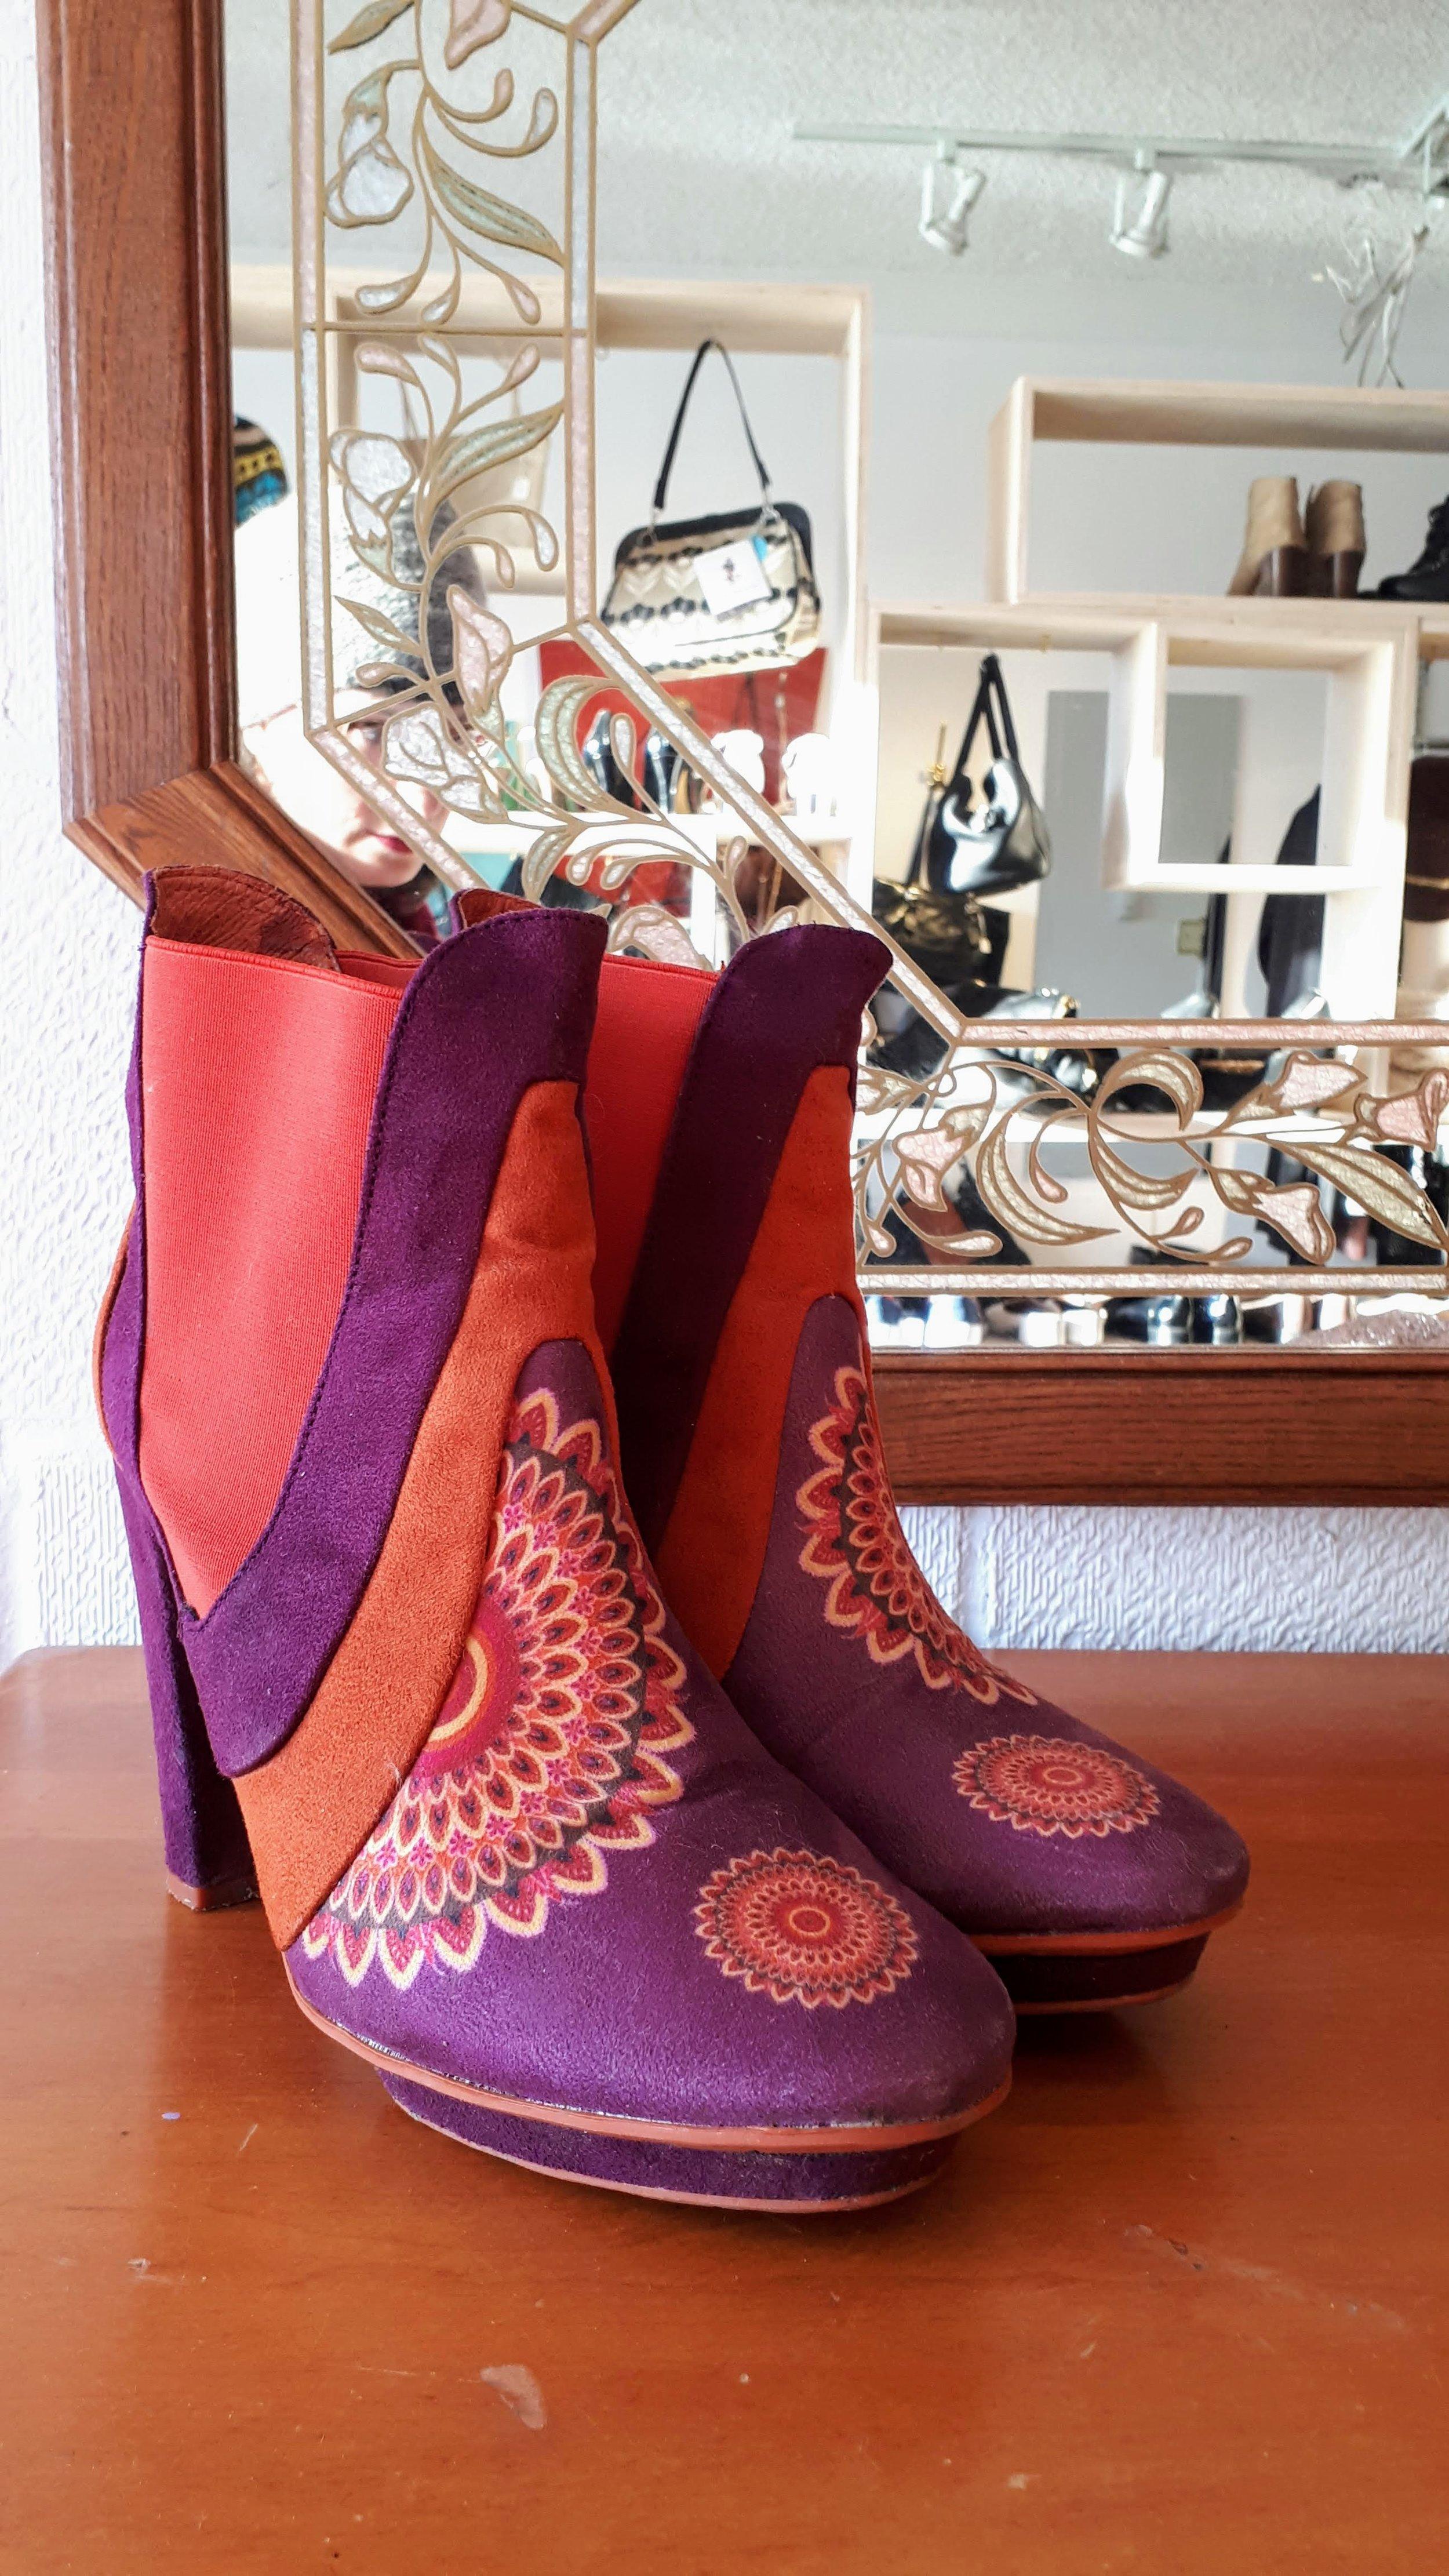 Desigual boots; Size 8.5, $72